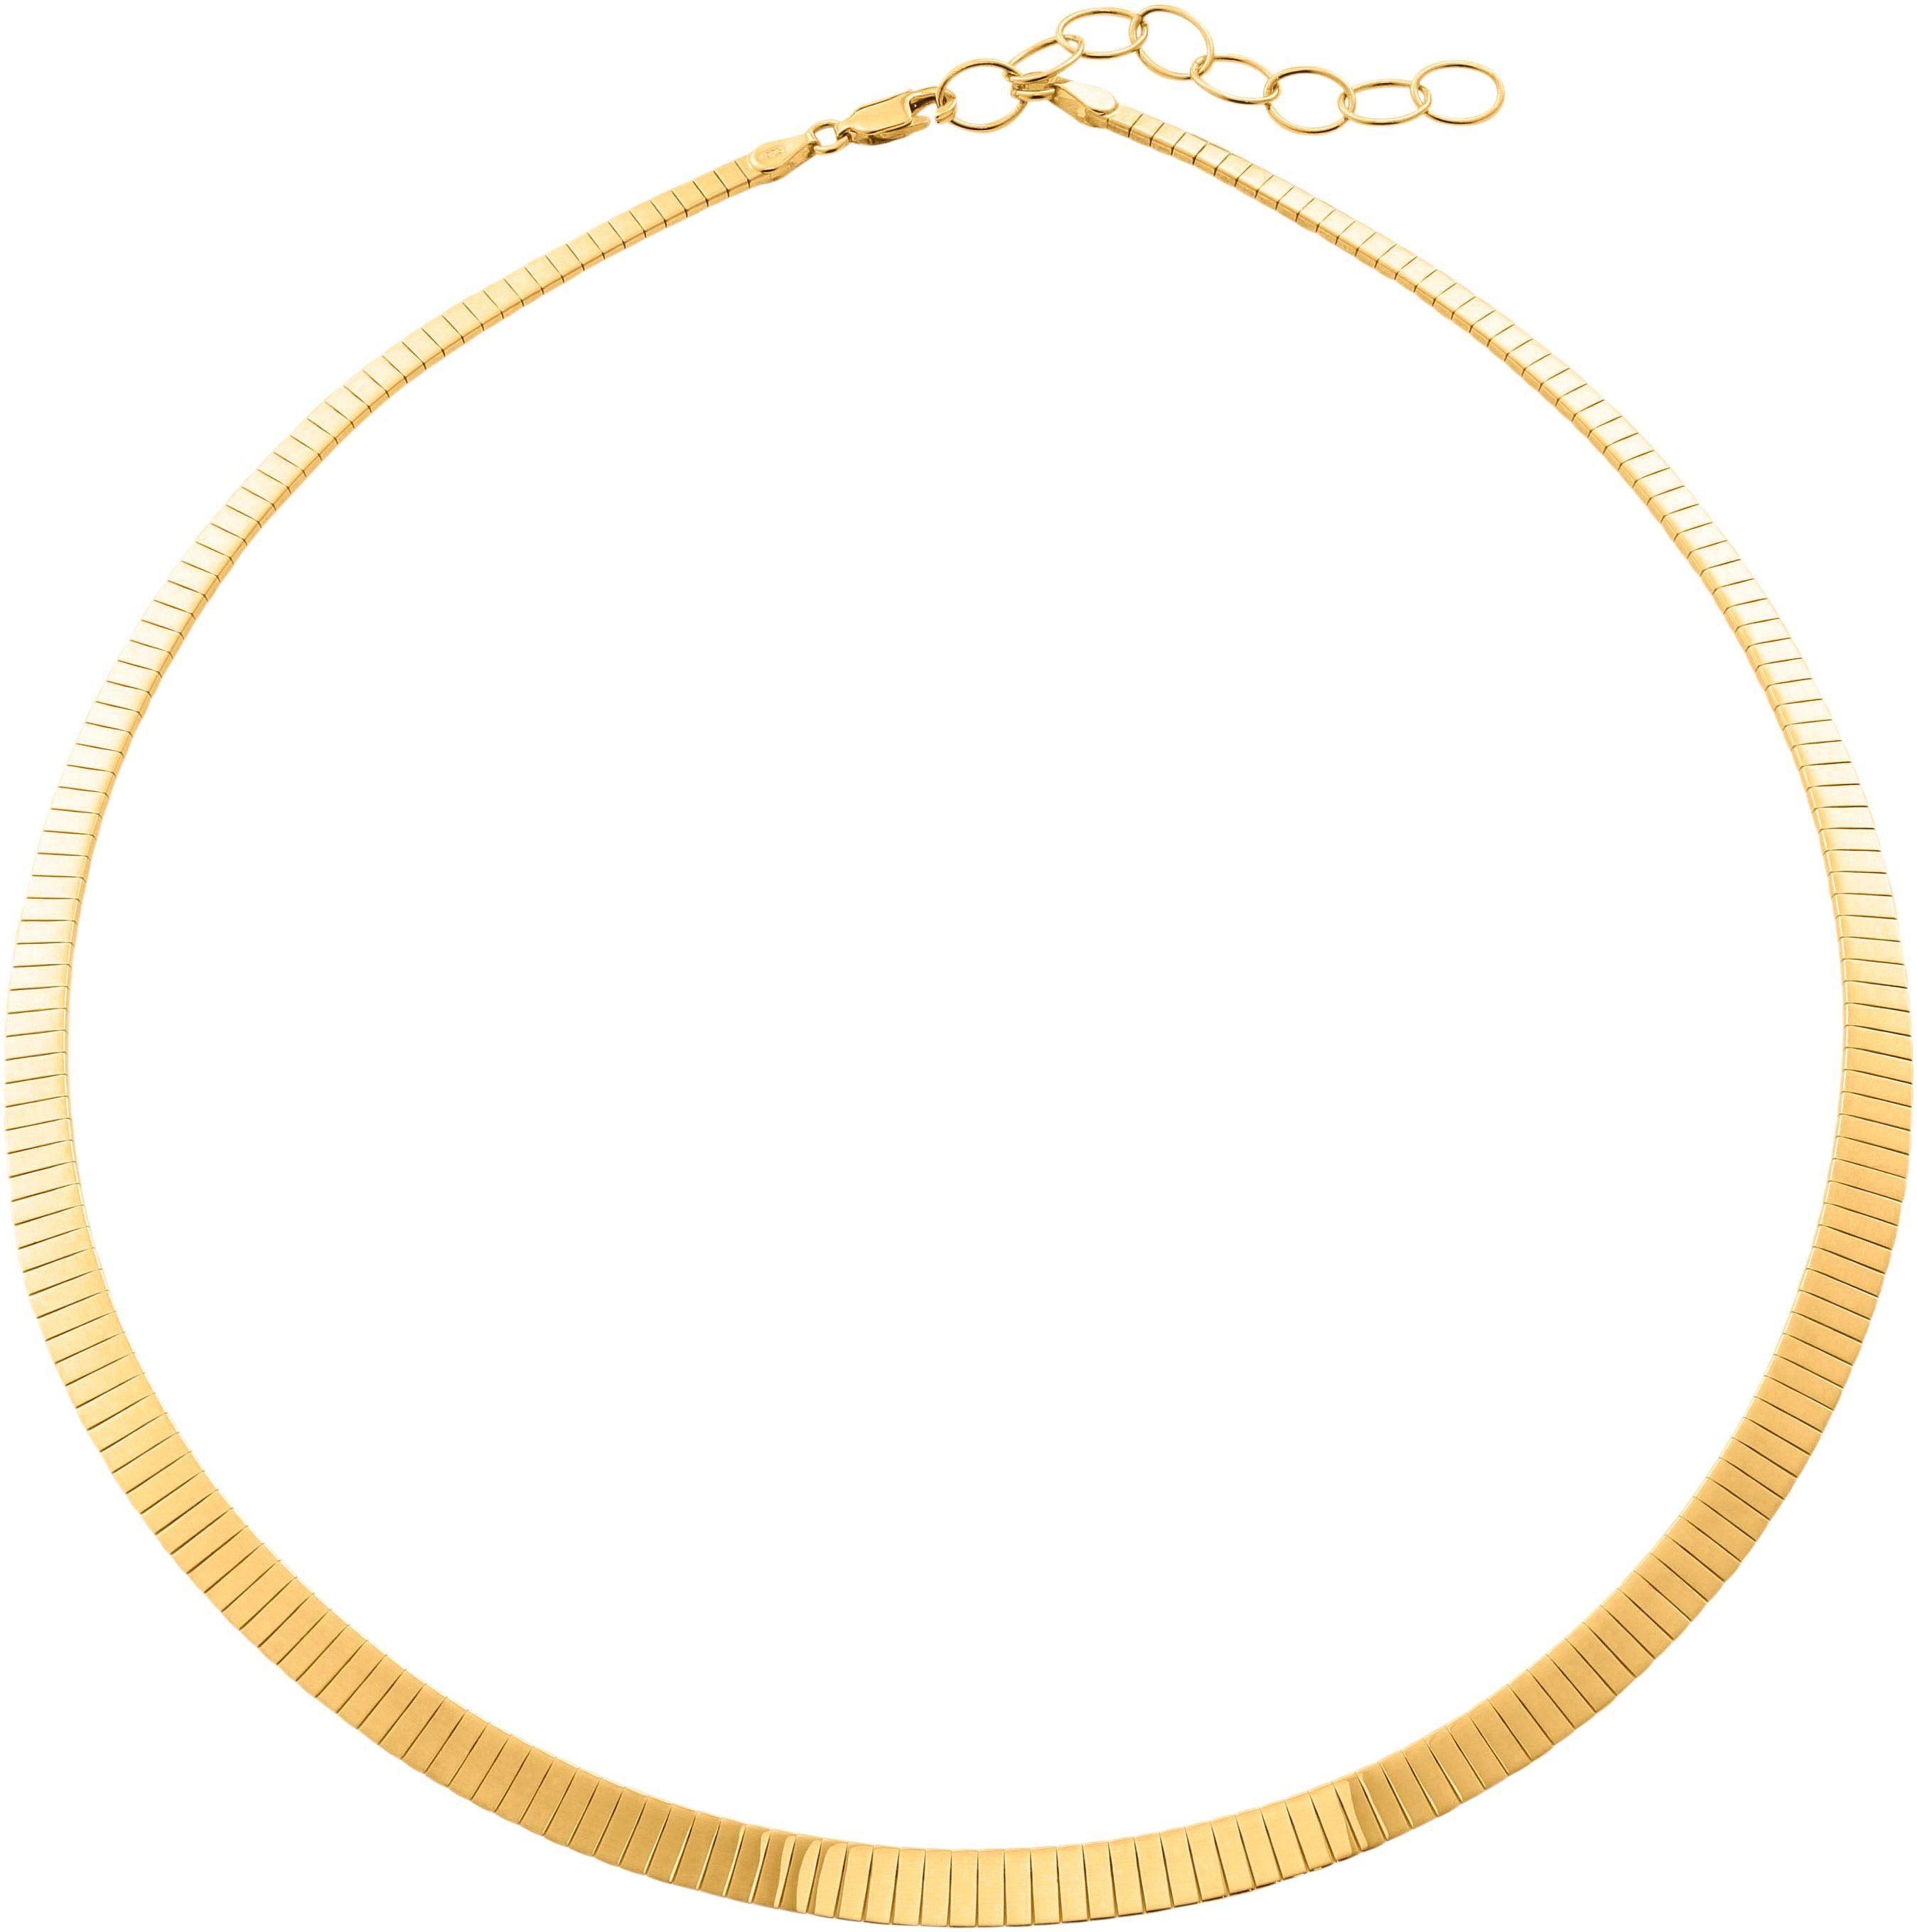 Kette im Kleopatra-Design